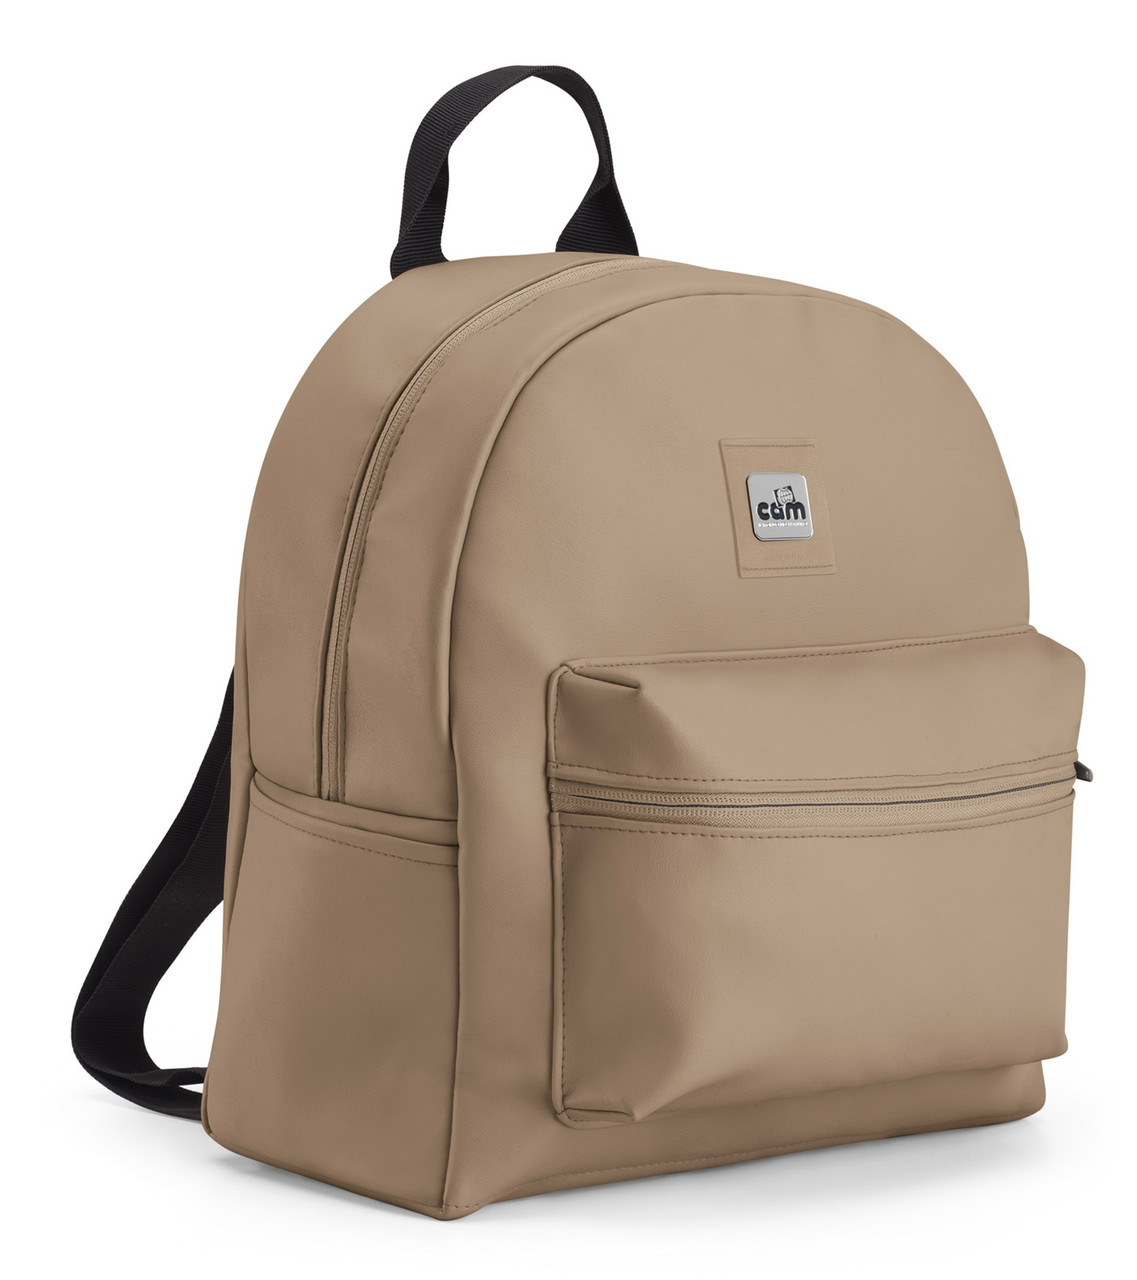 Рюкзак для мамы на коляску CAM Beki бежевый кожа